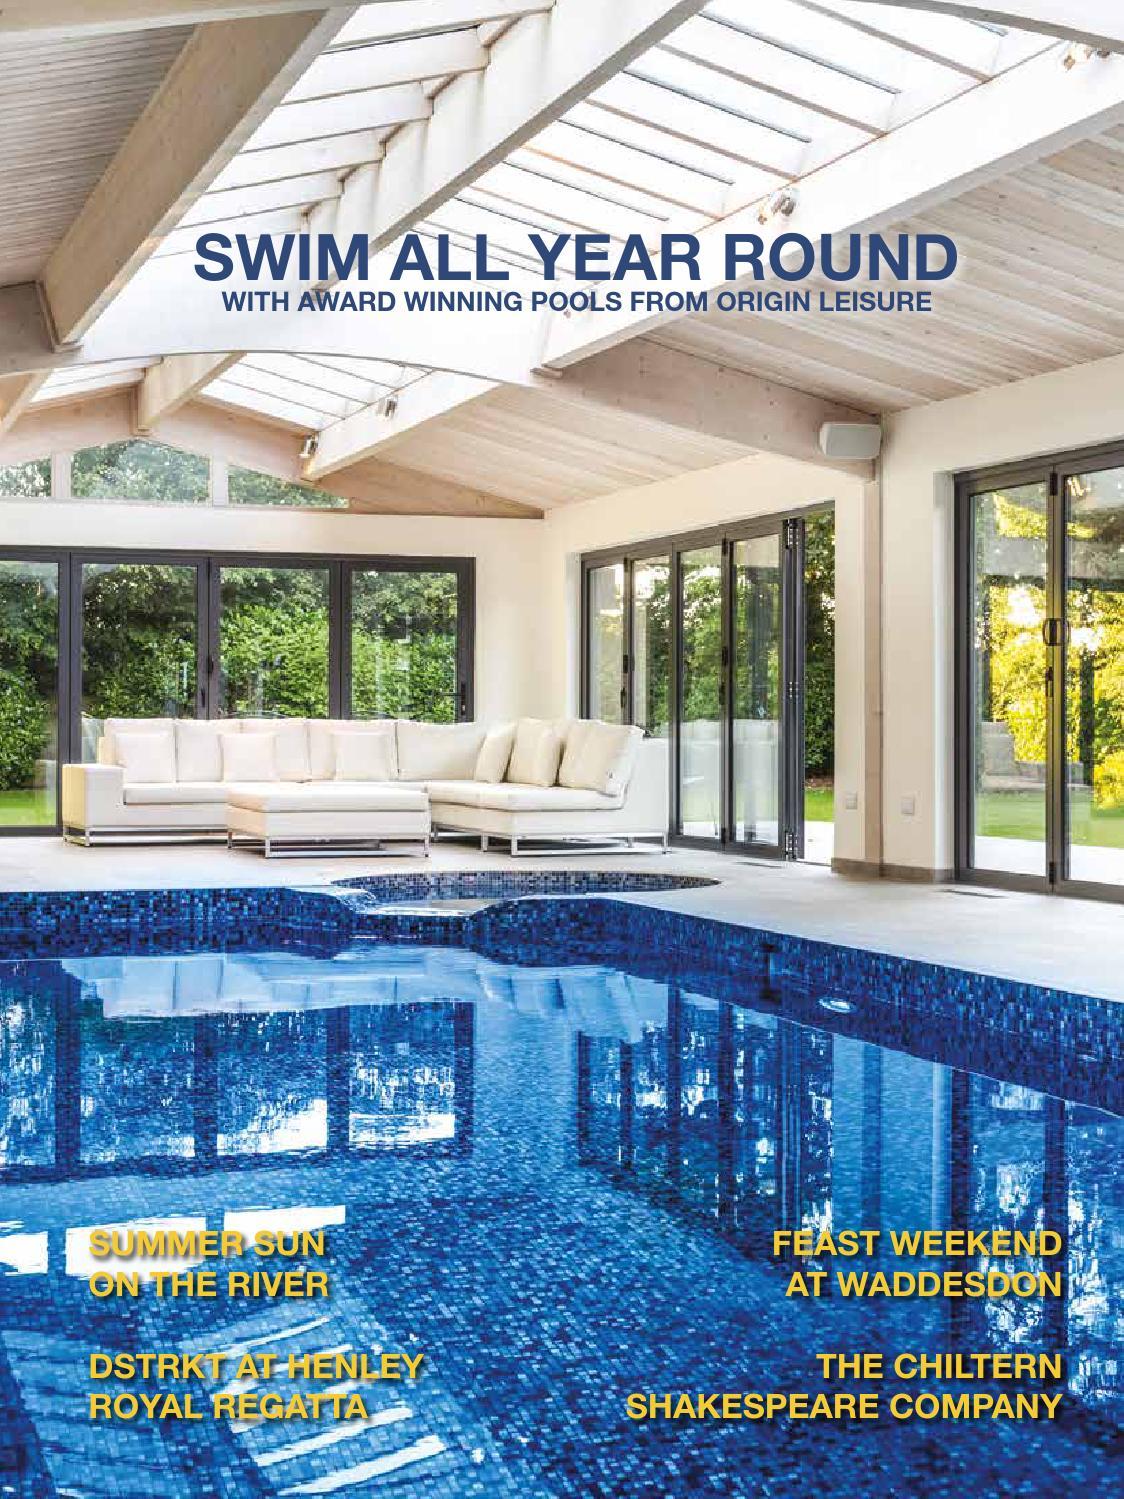 Bucks Life Book May 2016 By Fish Media Group Ltd Issuu